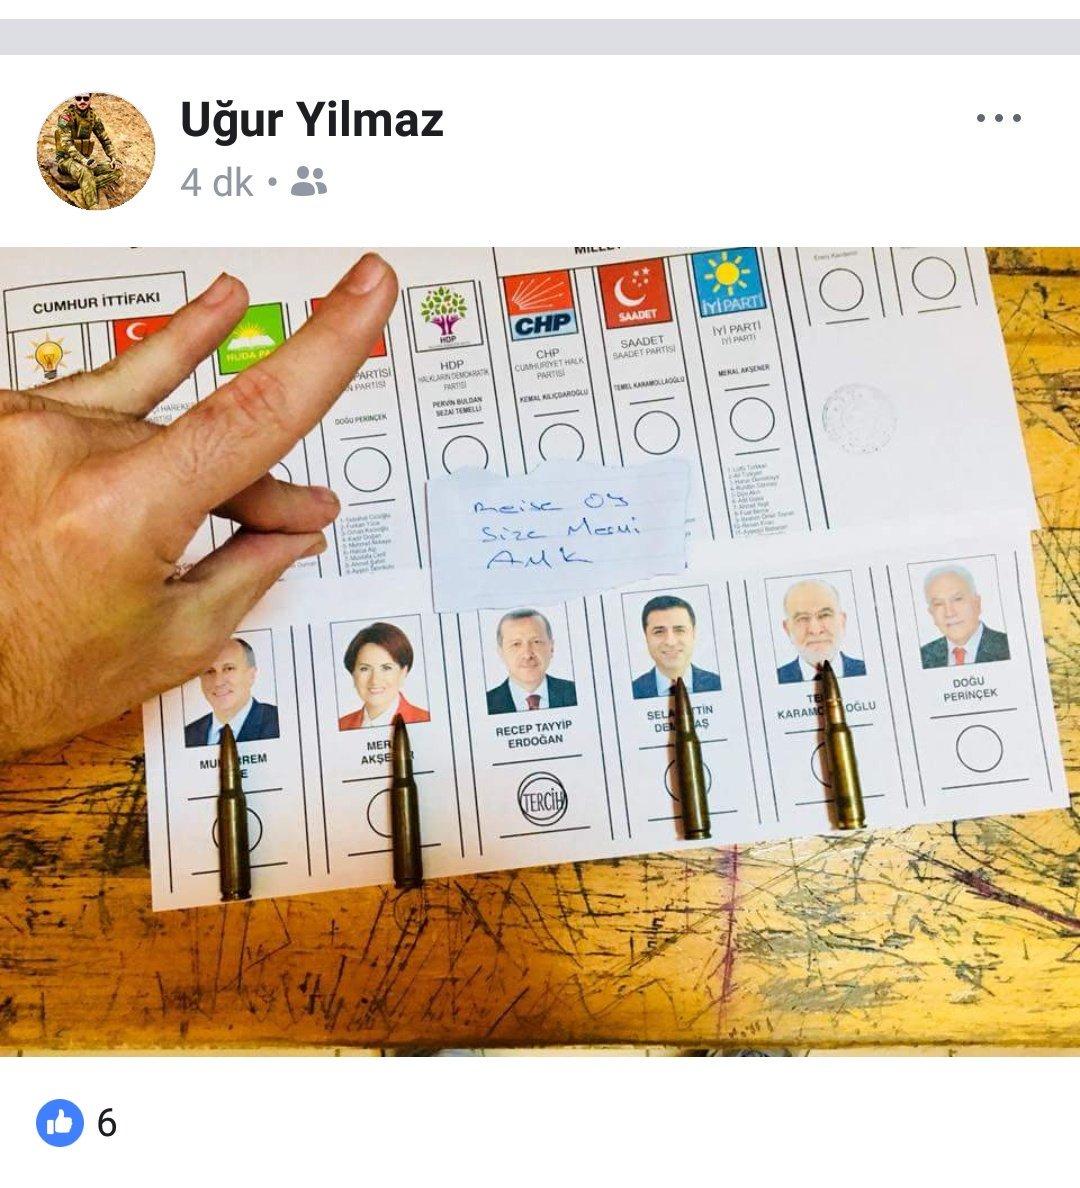 Turkey Extends Erdogan's Mandate, by Anatoly Karlin - The